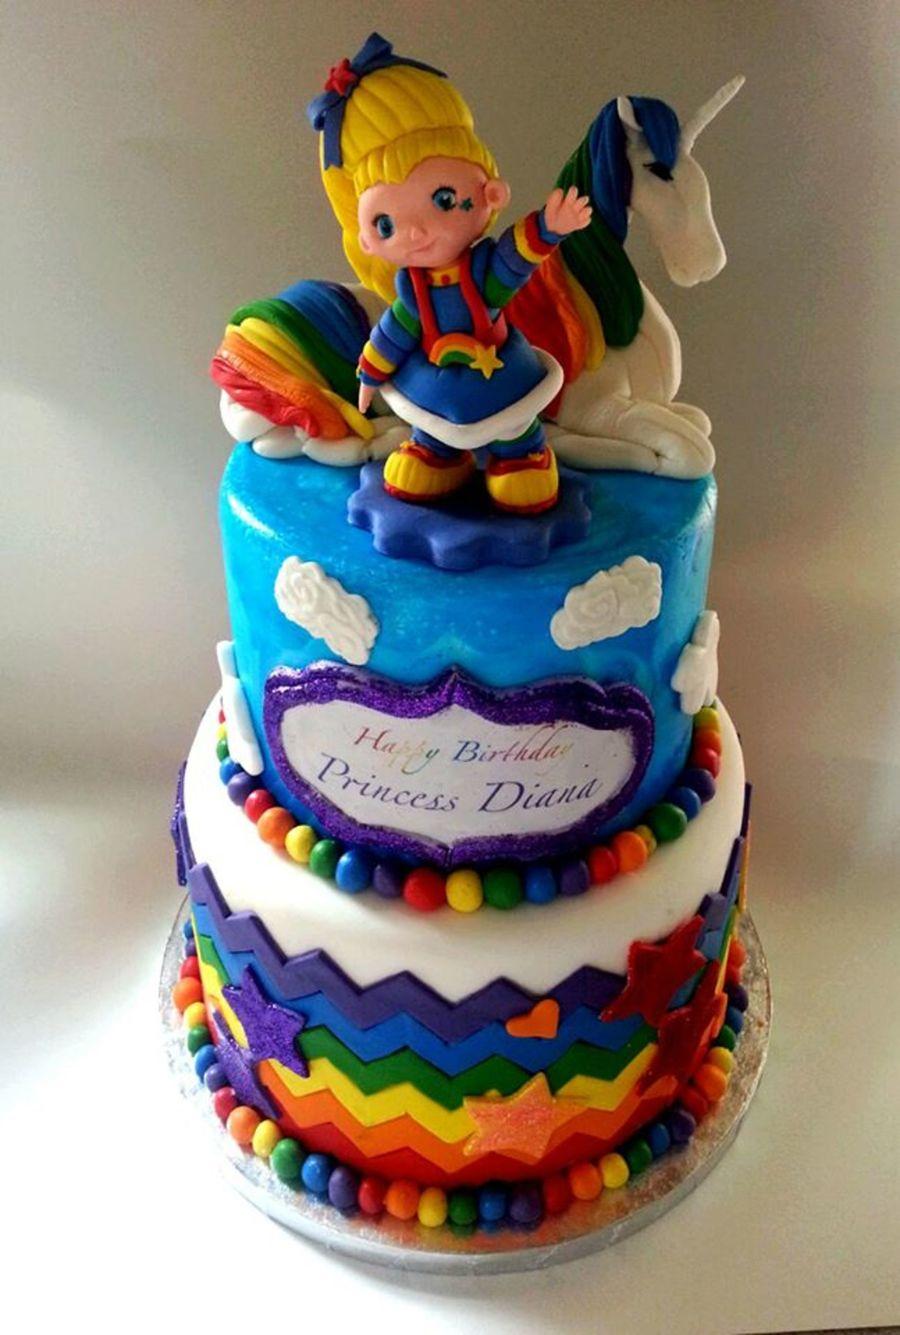 Rainbow Brite Cake Decorations